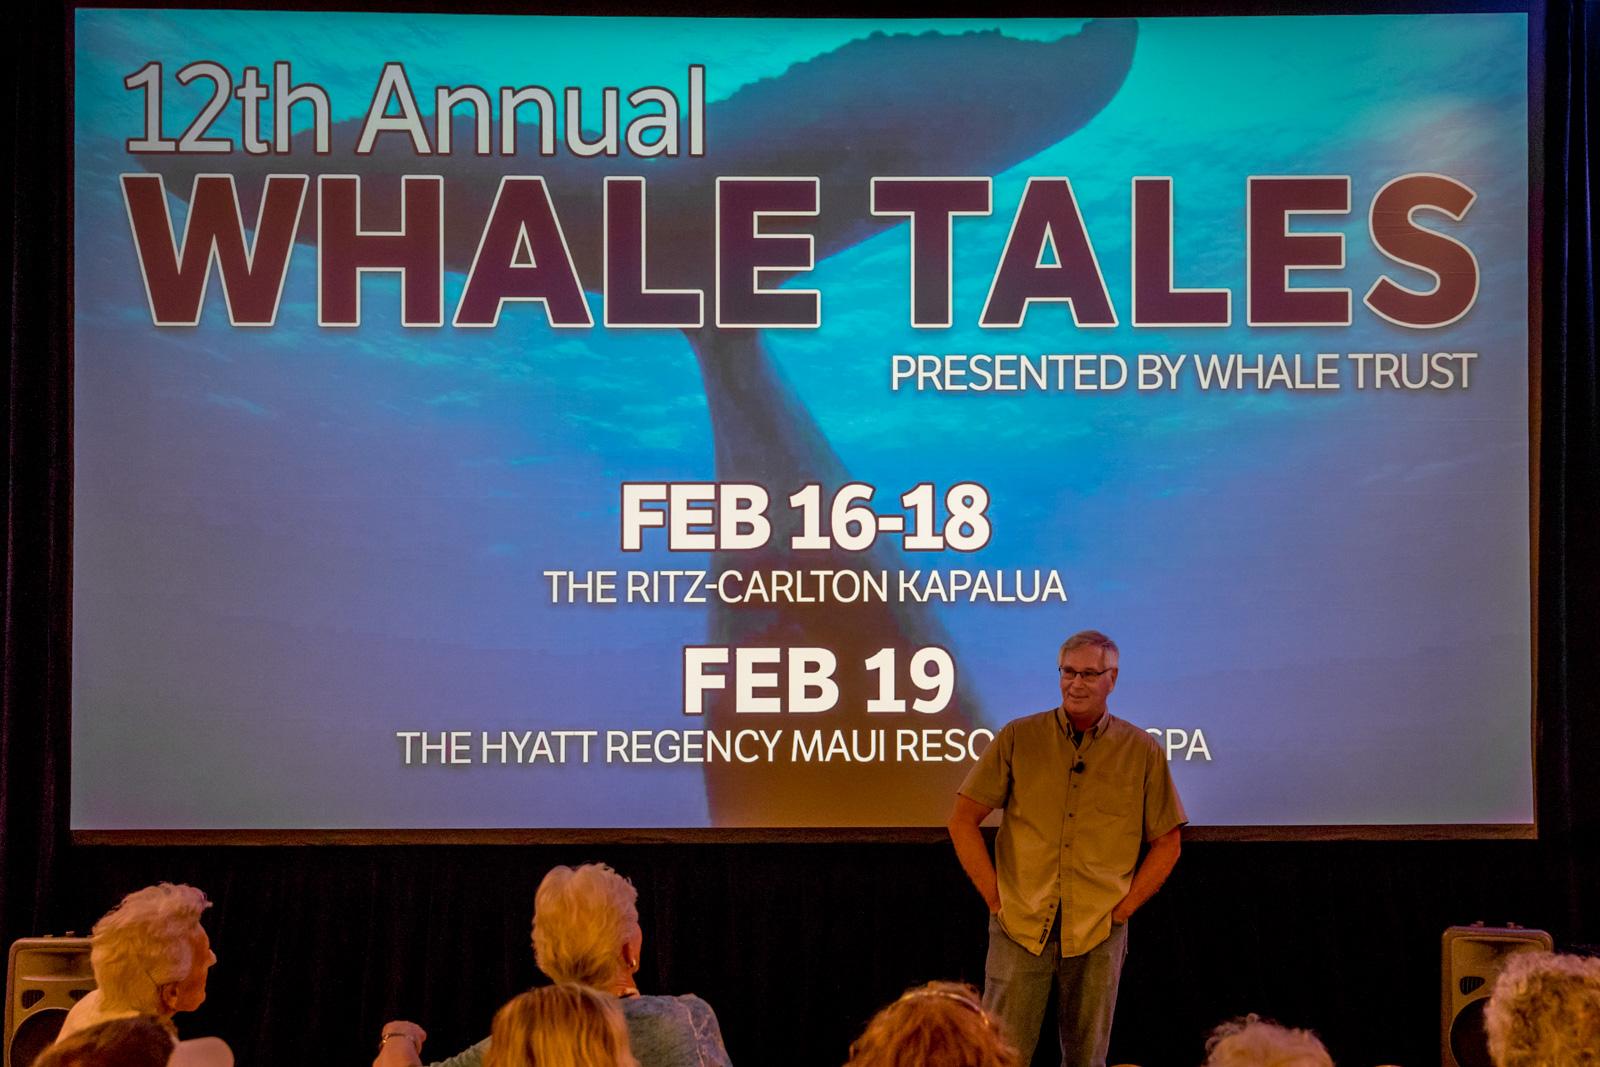 WhaleTales_2018-3451_web_berkowitz